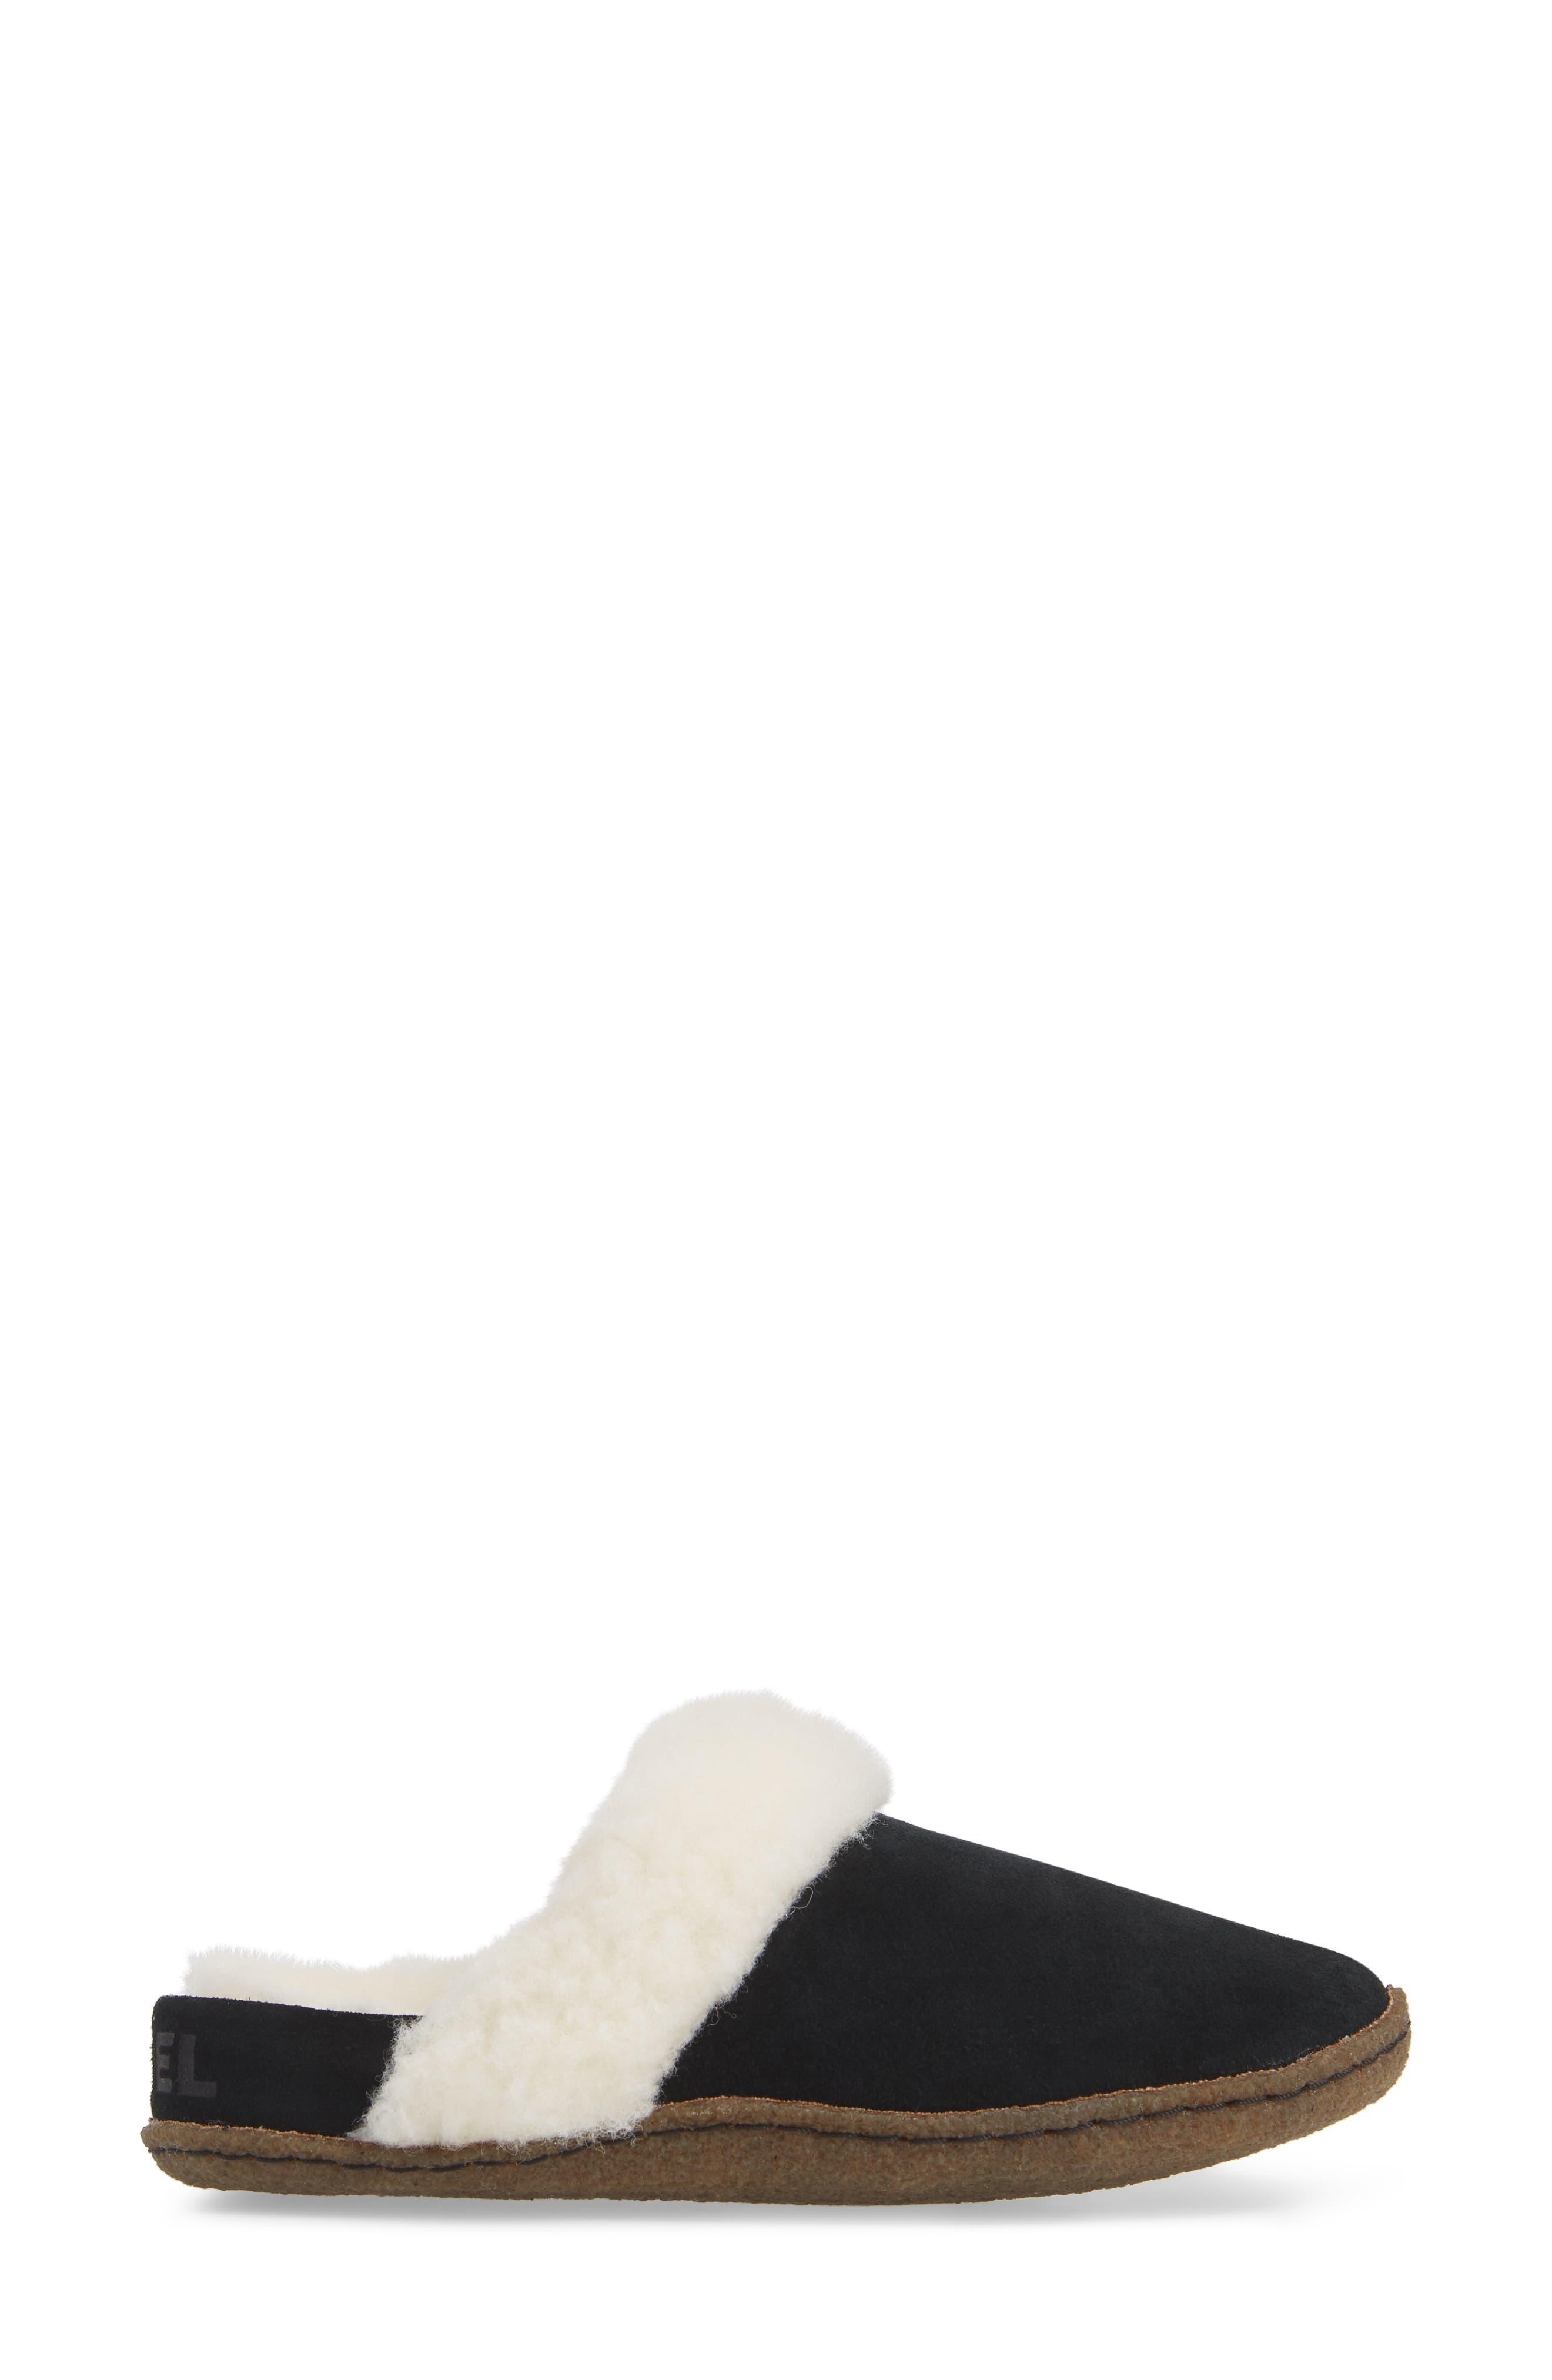 Nakiska II Faux Shearling Lined Slide Slipper,                             Alternate thumbnail 3, color,                             BLACK/ NATURAL